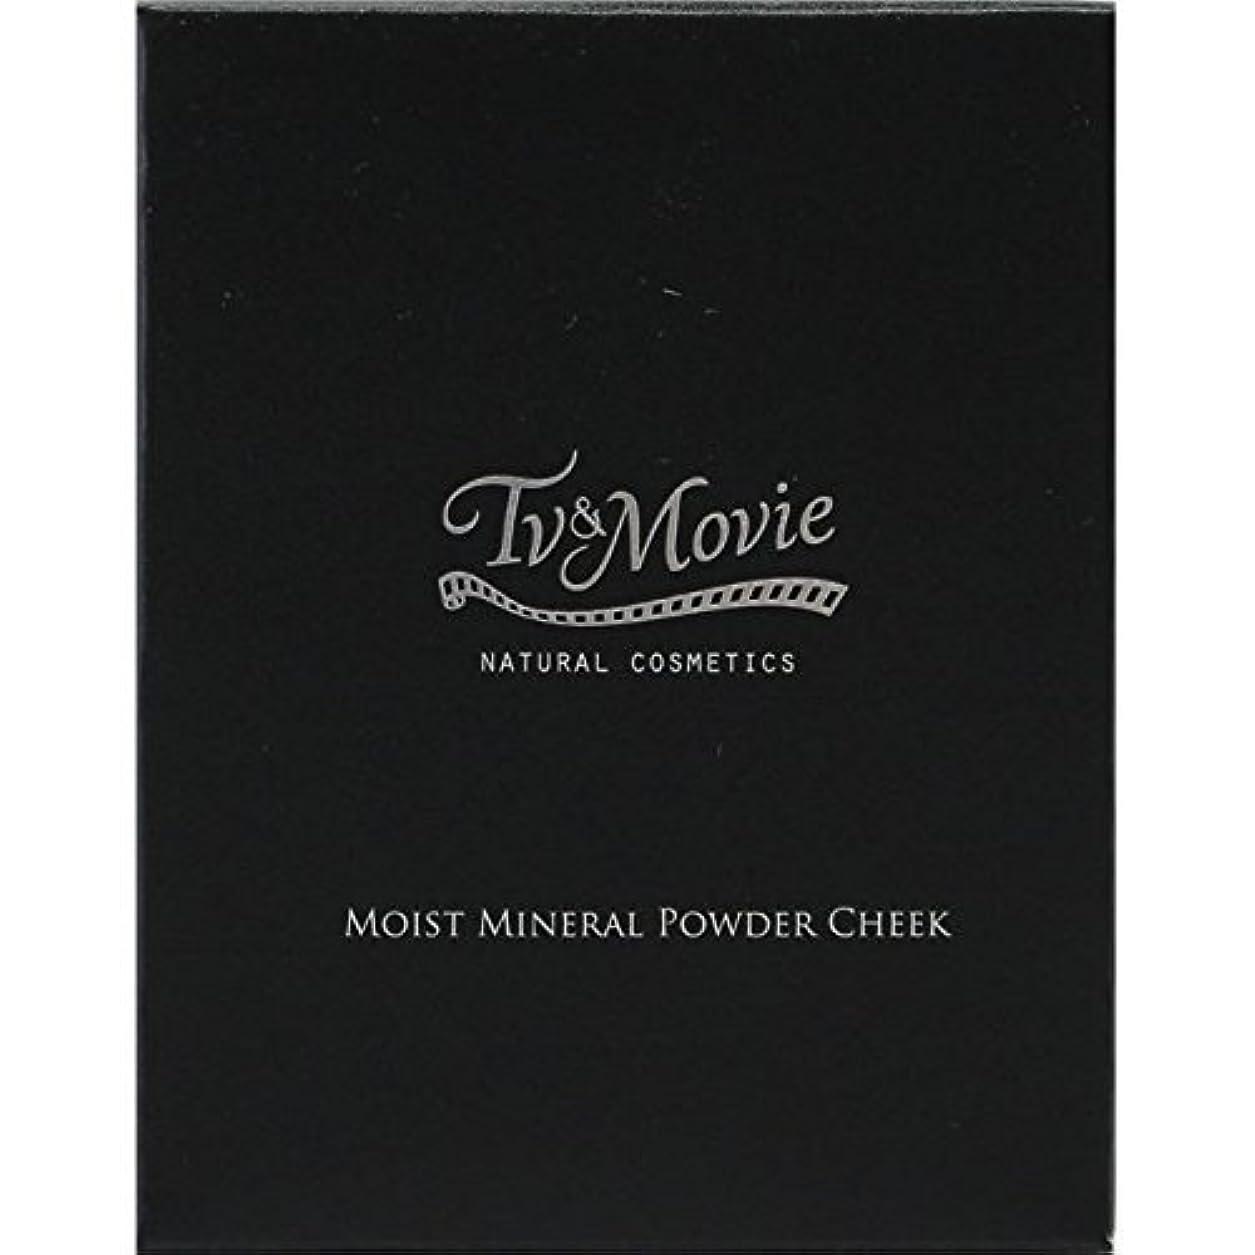 Tv&Movie モイストミネラル パウダーチーク 02 スイートオレンジ 5g